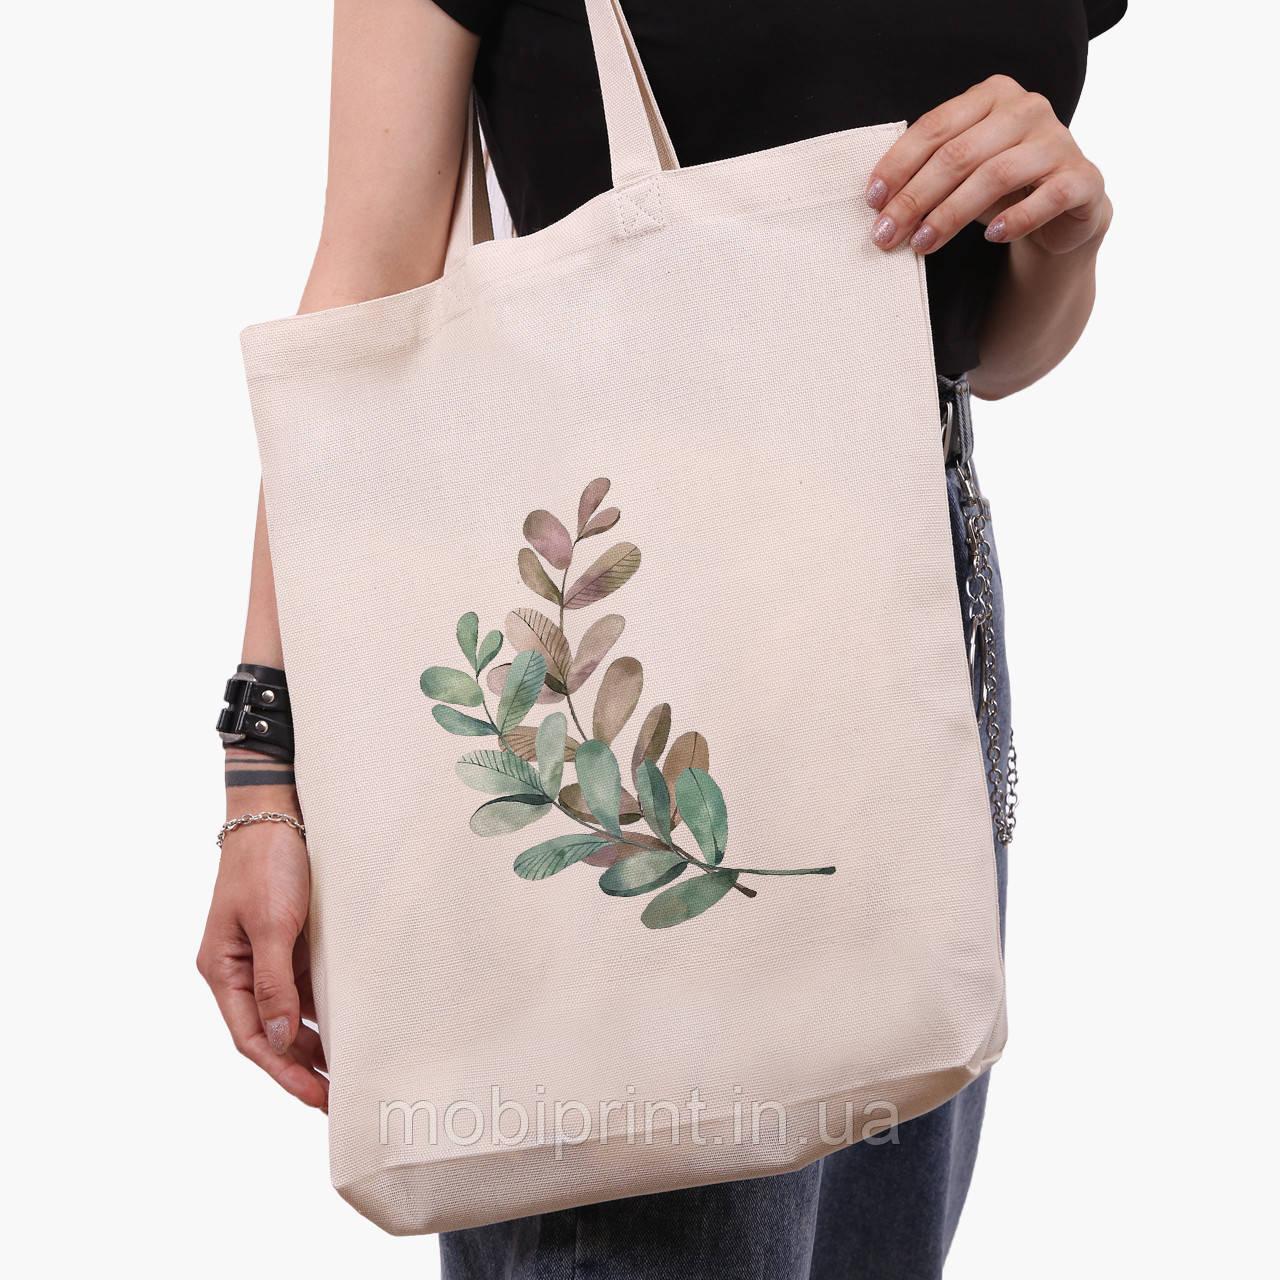 Эко сумка шоппер белая Экология (Ecology) (9227-1332-1)  экосумка шопер 41*39*8 см